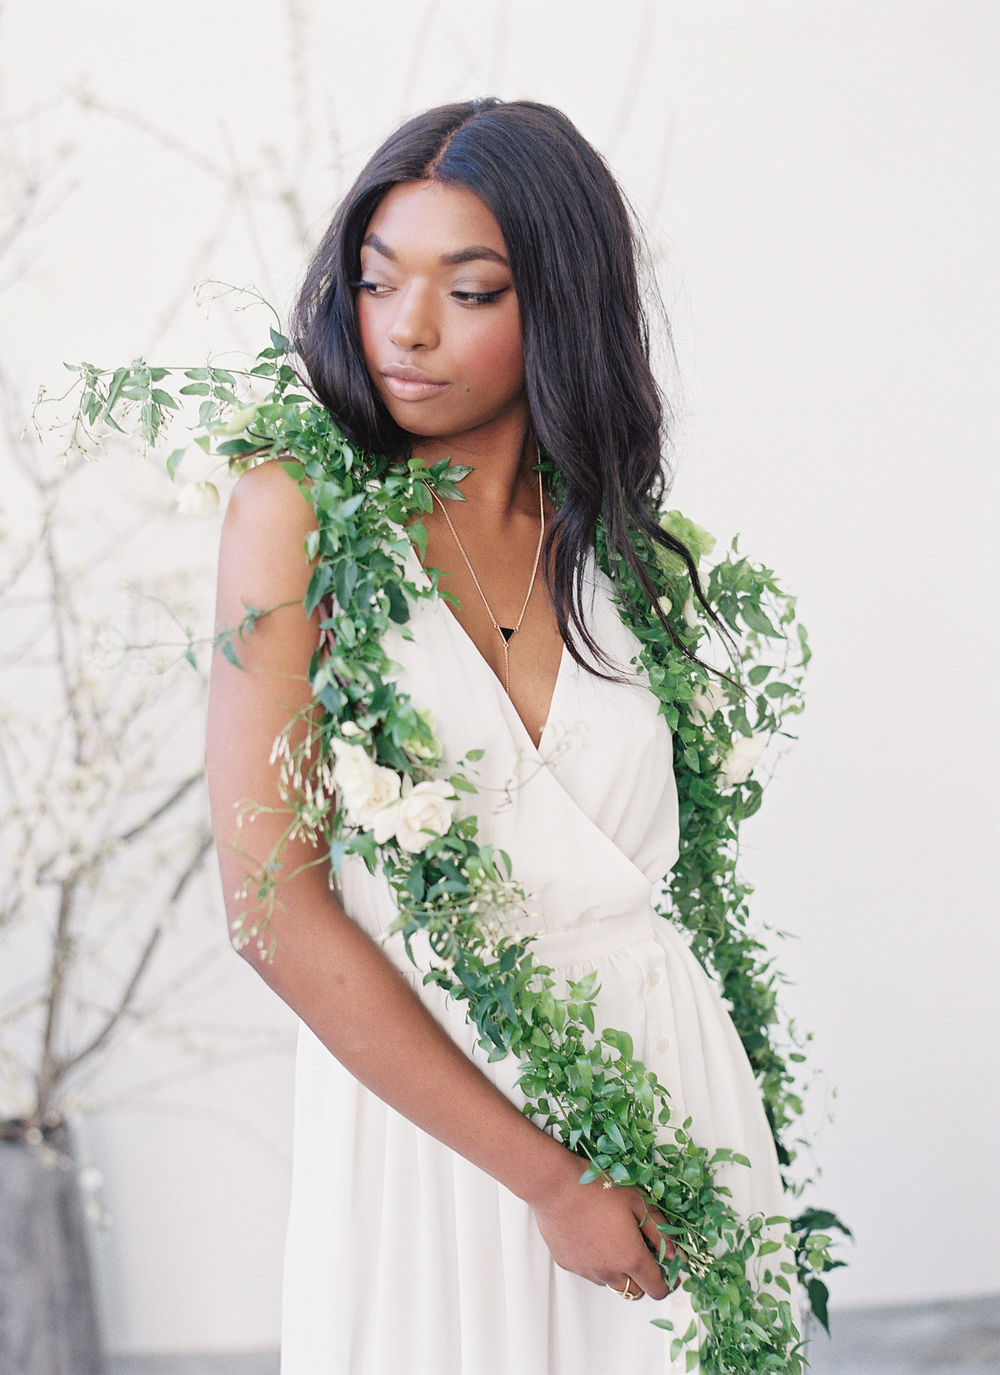 Floralessence-Esmeraldafranco-65.JPG